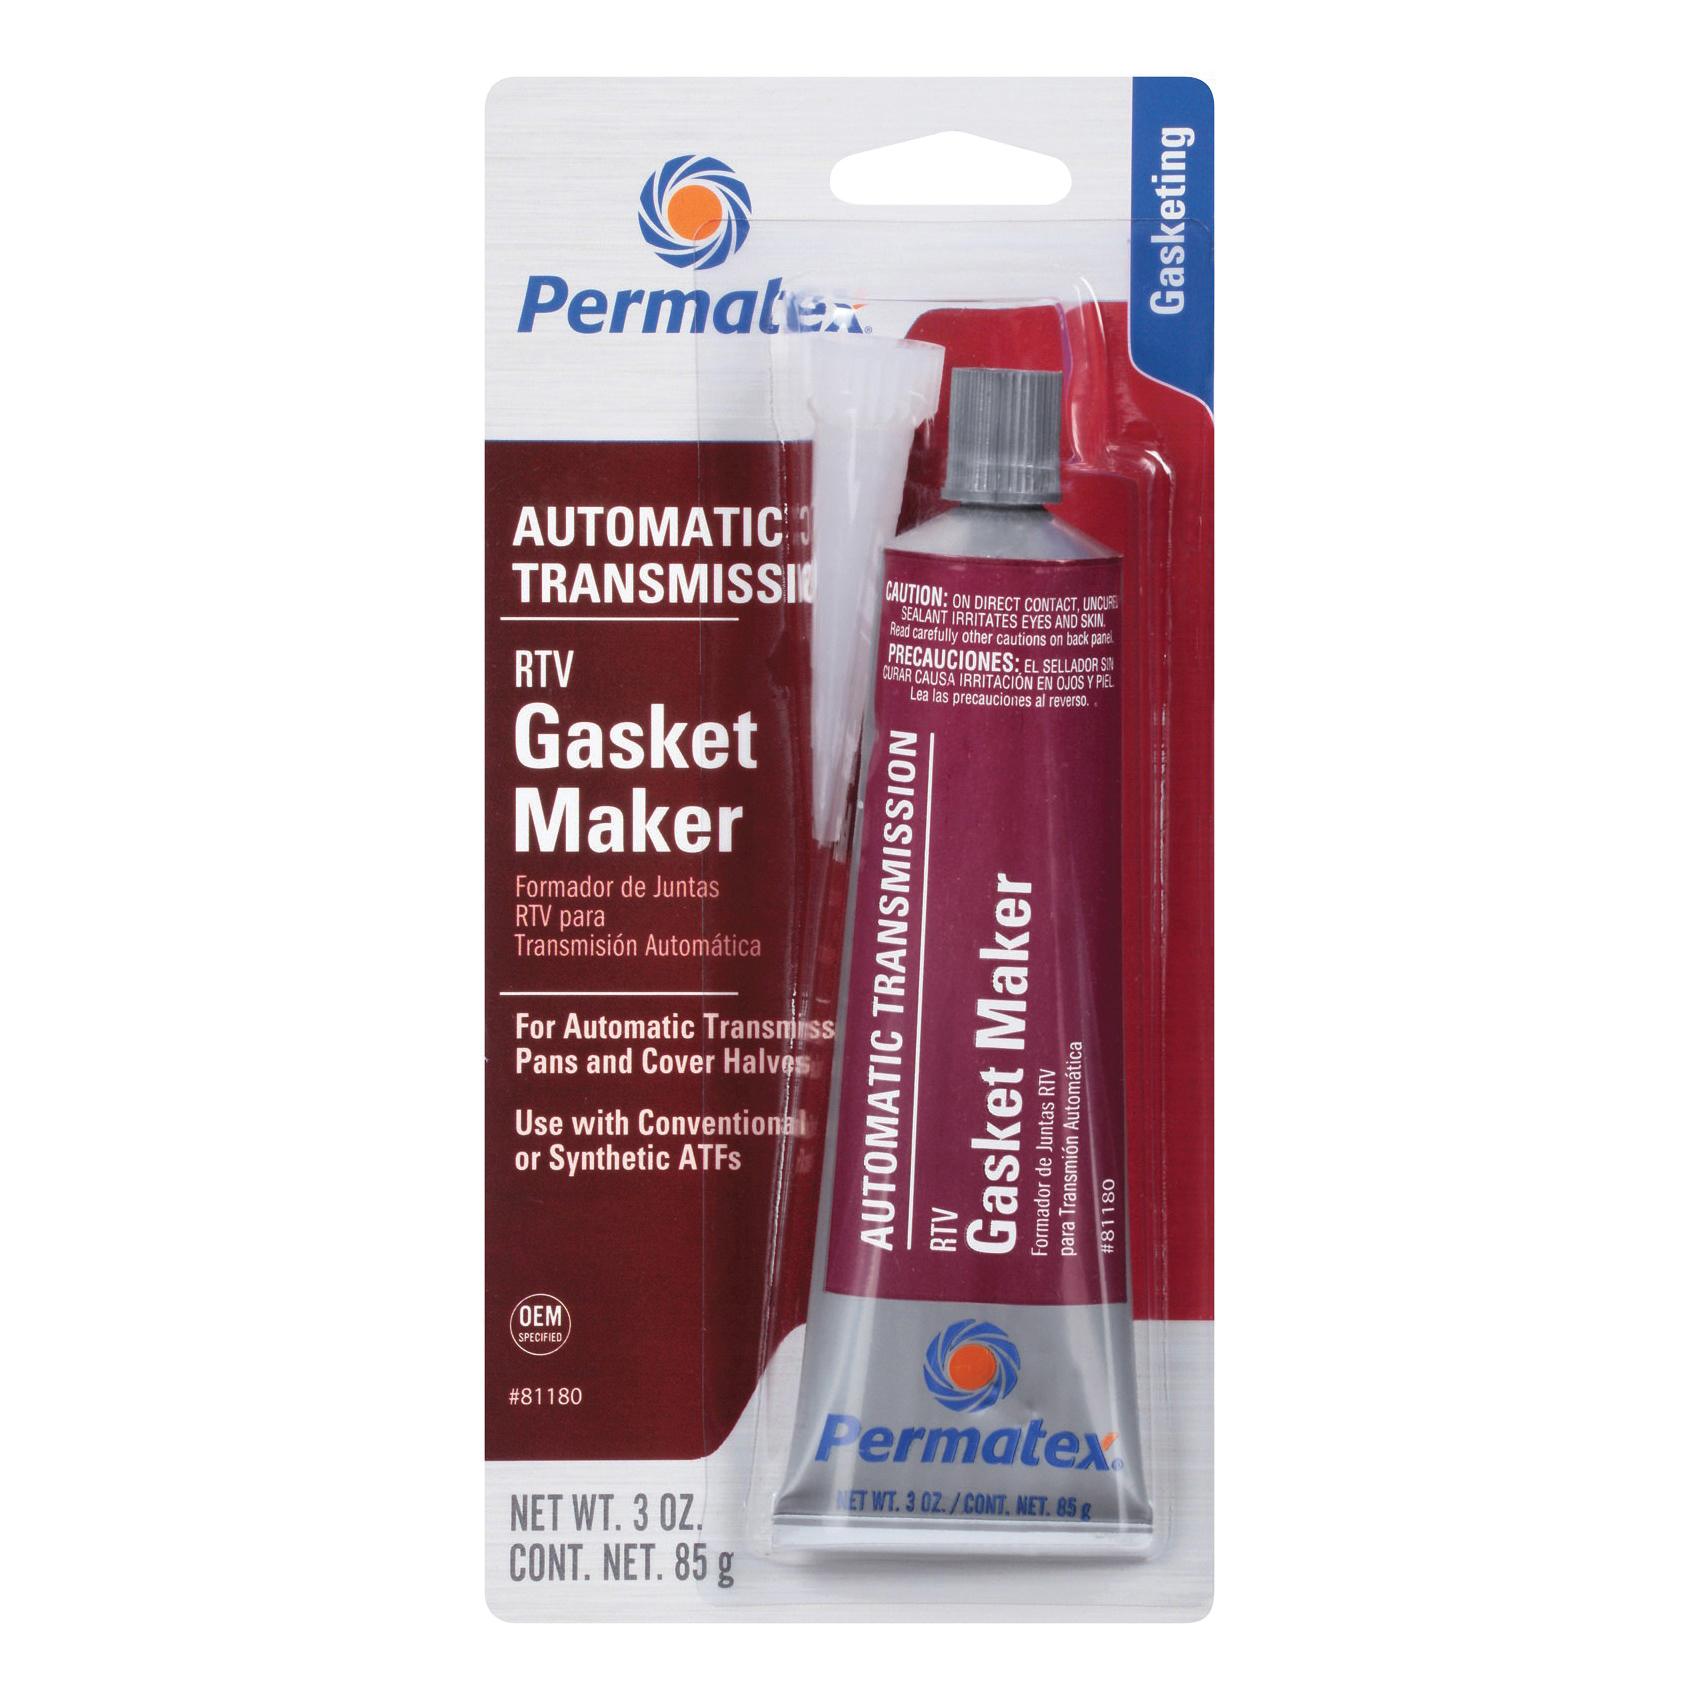 Picture of Permatex 81180 Gasket Maker, 3 oz Package, Tube, Paste, Mild